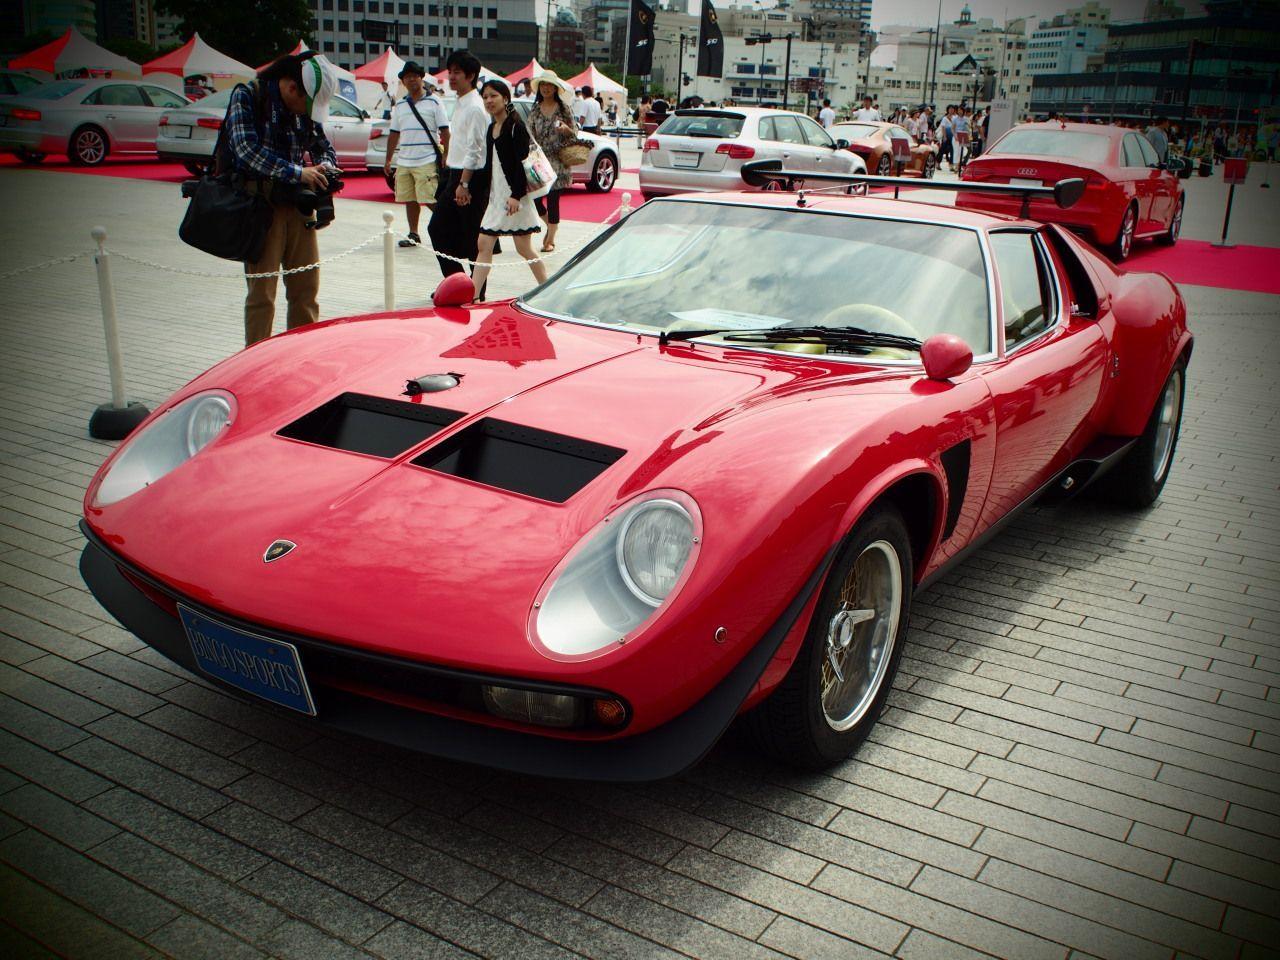 Lamborghini Miura Jota Svr Body Kits In The Crew Forums Miura